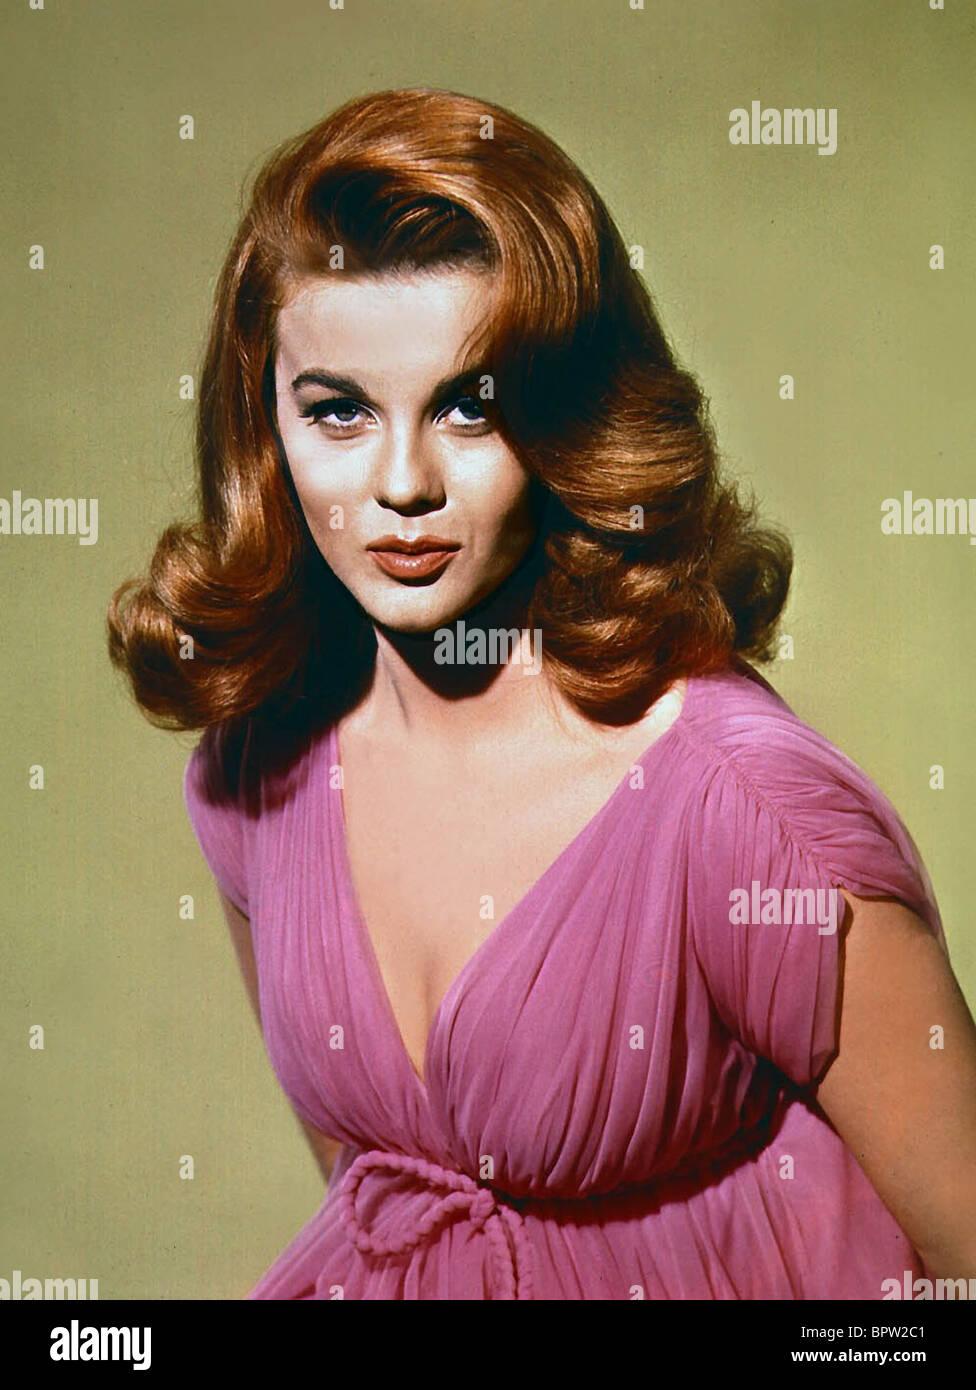 ANN-MARGRET ACTRESS (1968) - Stock Image